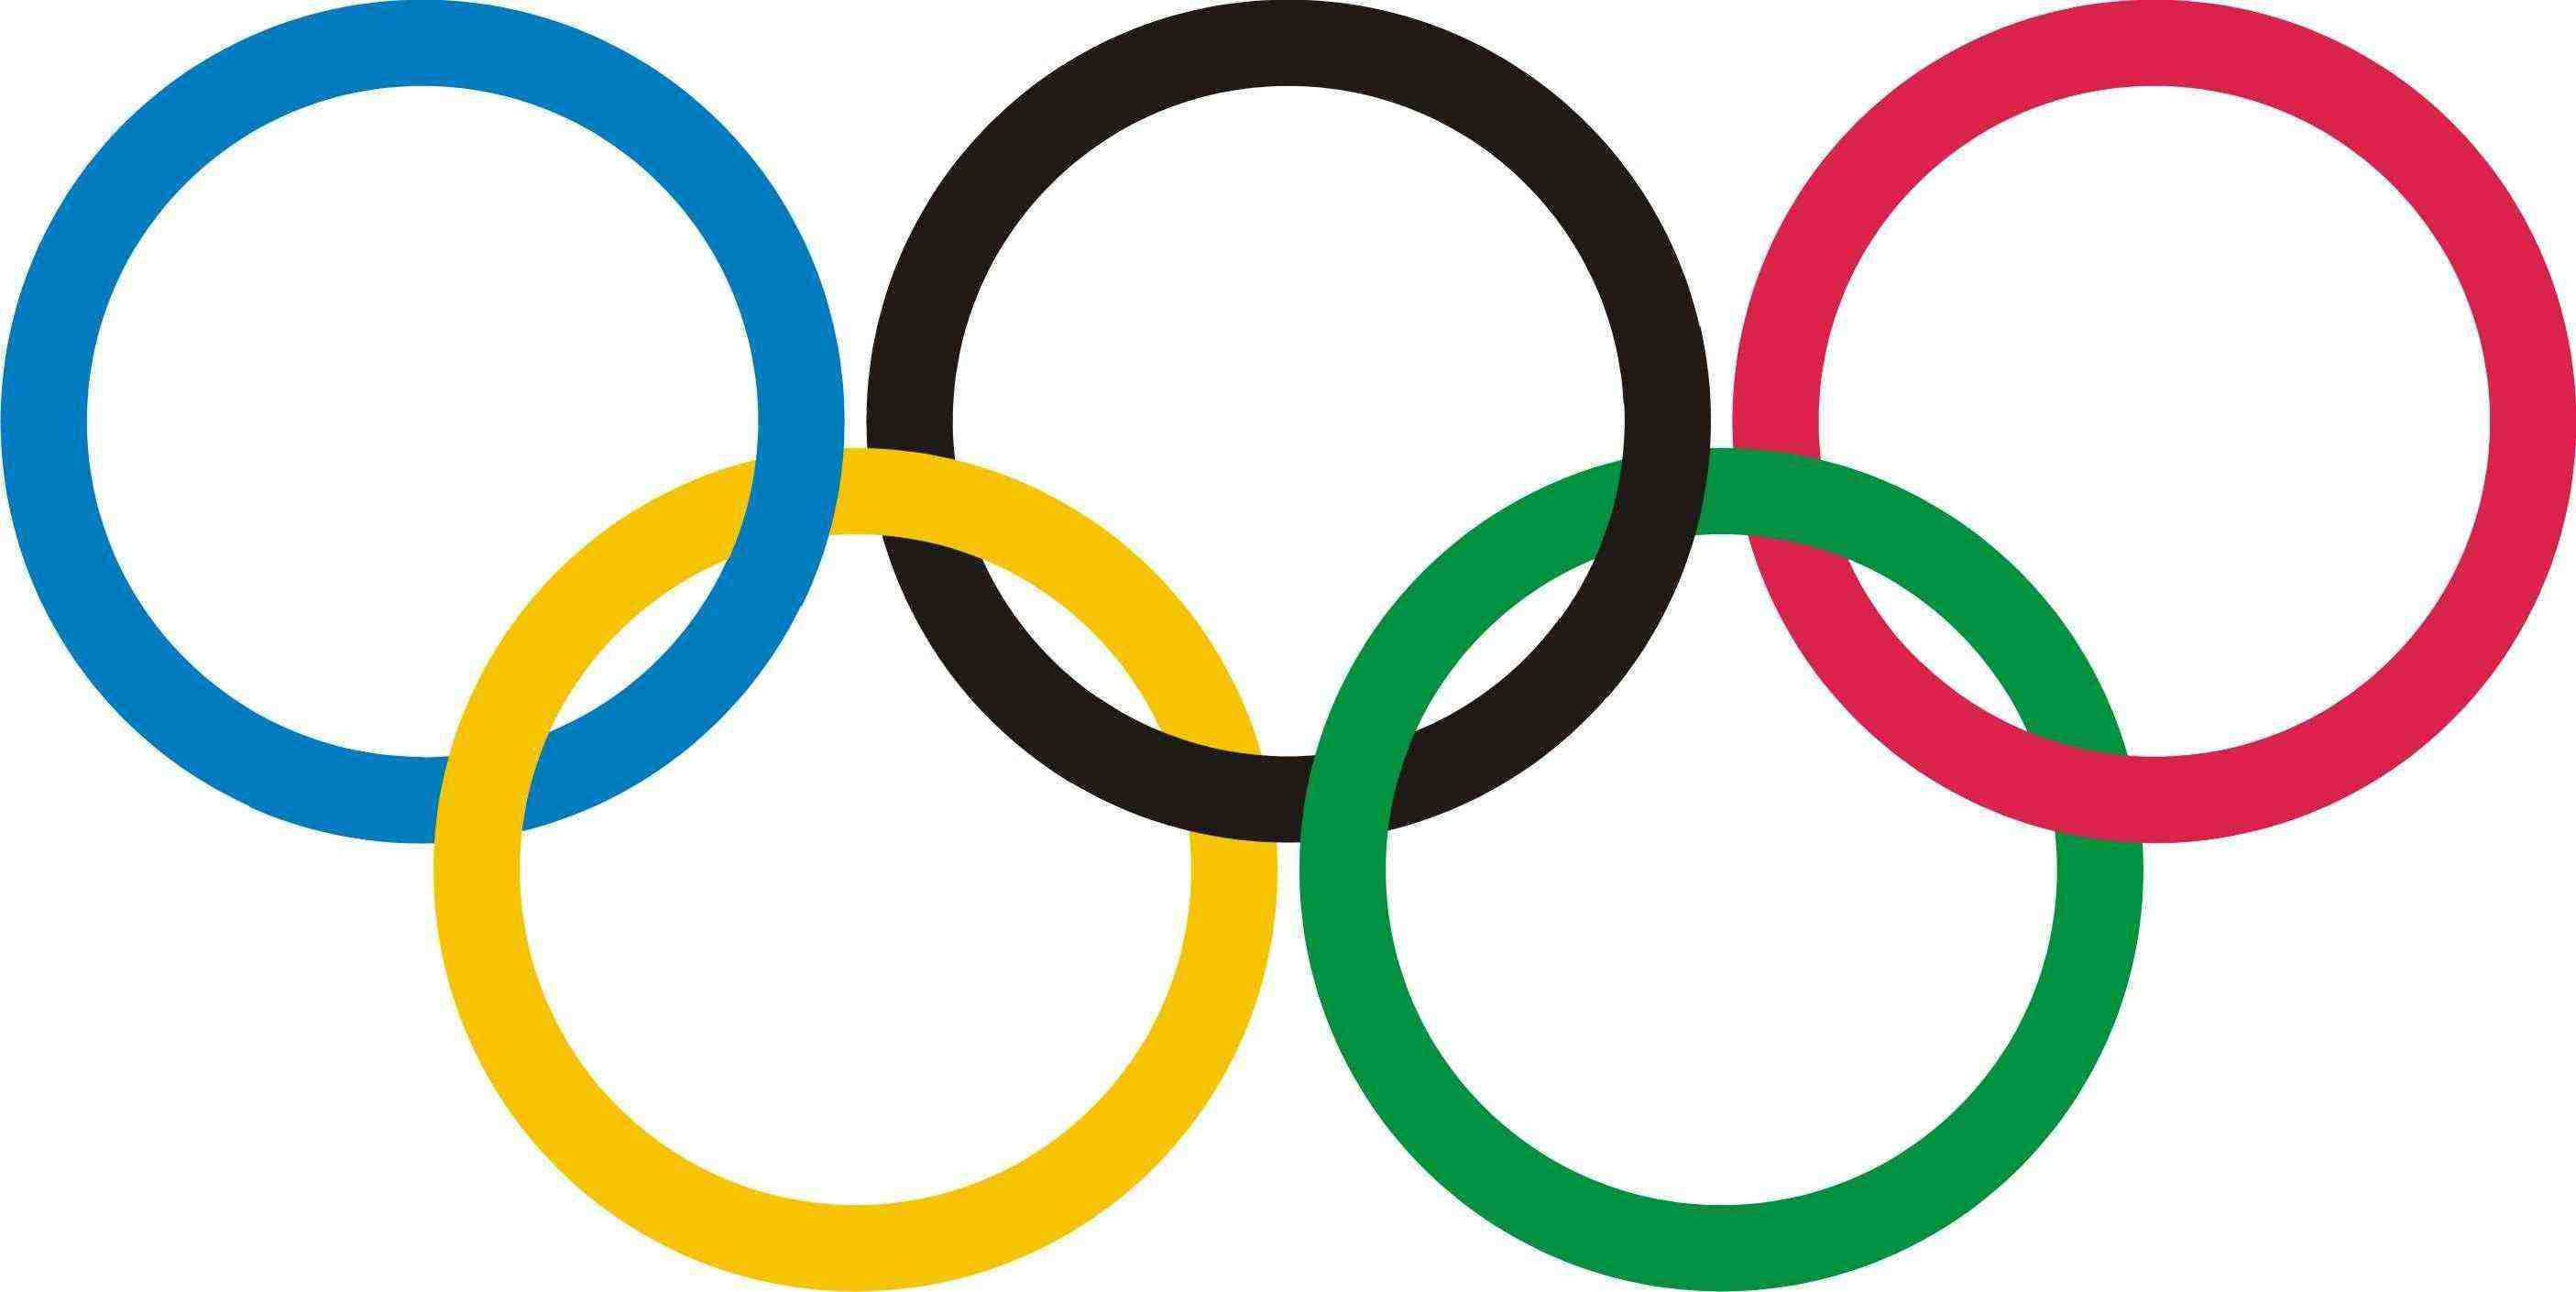 Олимпиада 2012 �его ожида��